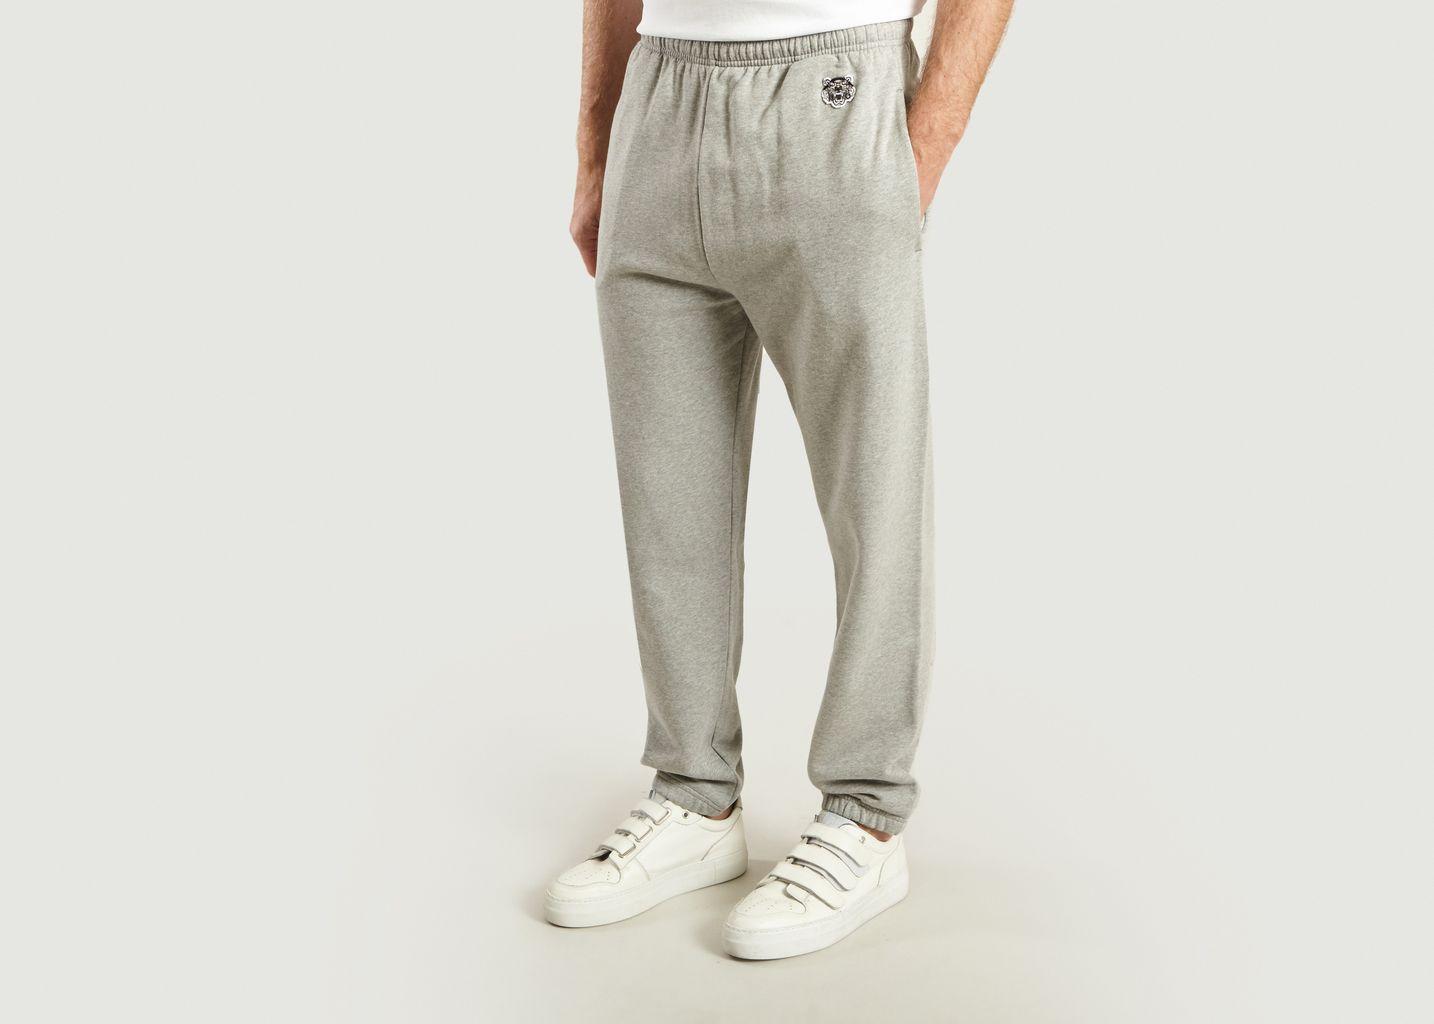 Pantalon de Jogging Tigre - Kenzo